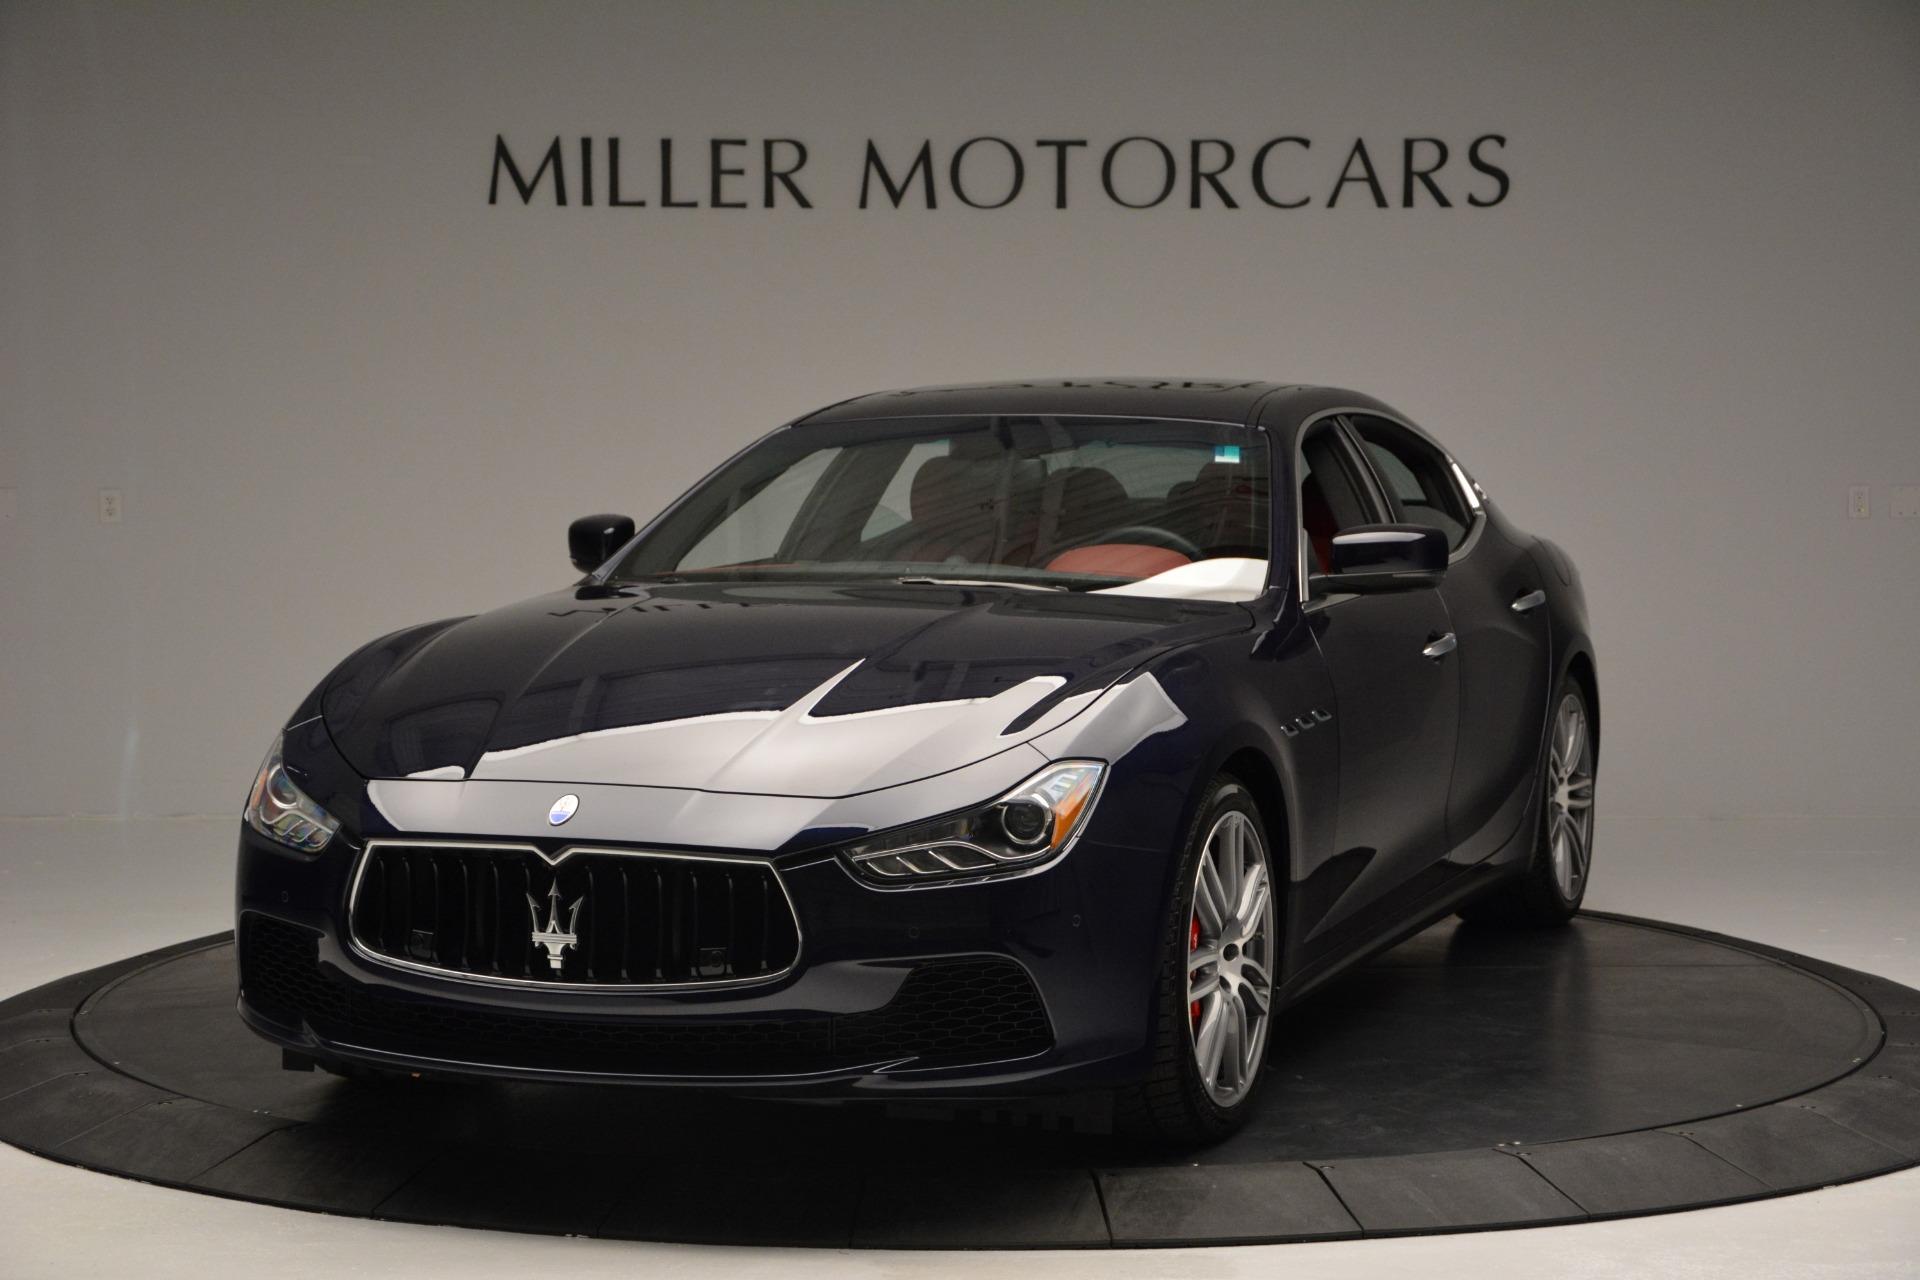 New 2017 Maserati Ghibli S Q4 For Sale In Greenwich, CT 607_main